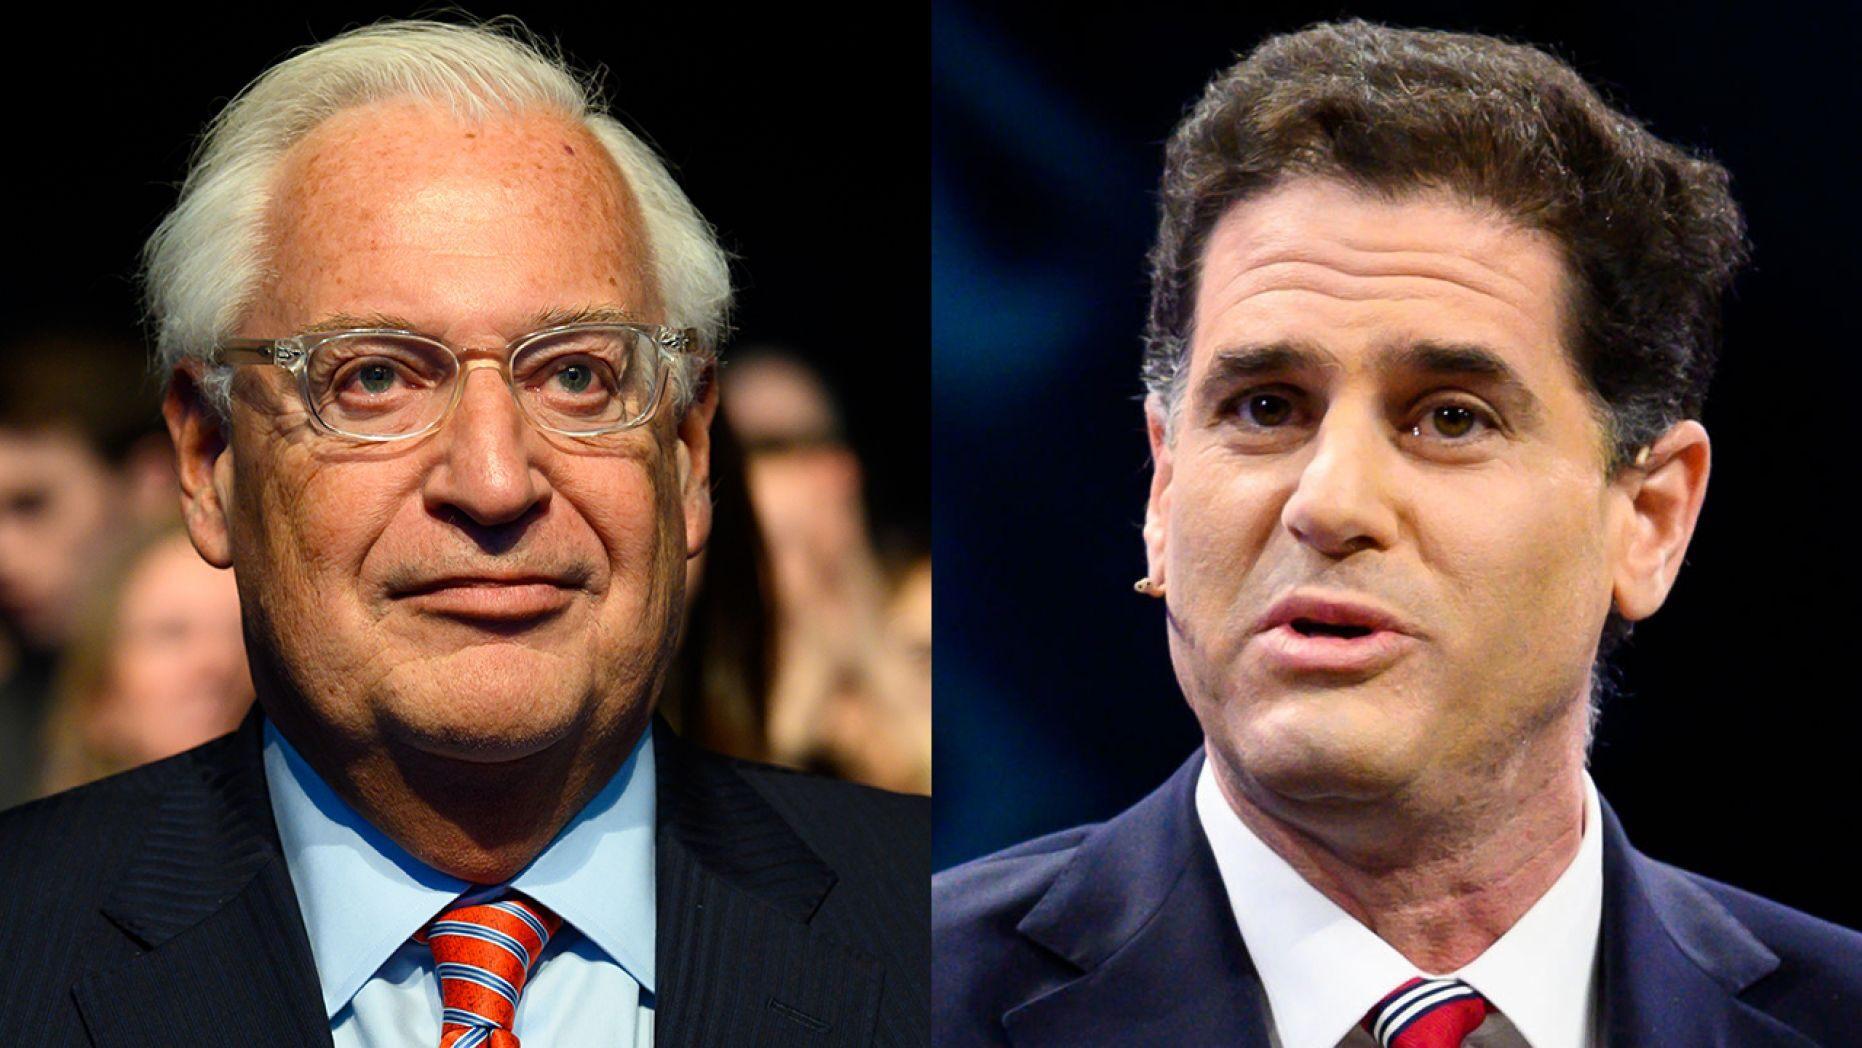 David Friedman, the U.S. ambassador to Israel (left), and Ron Dermer, Israel's ambassador to Washington (right). (Getty).